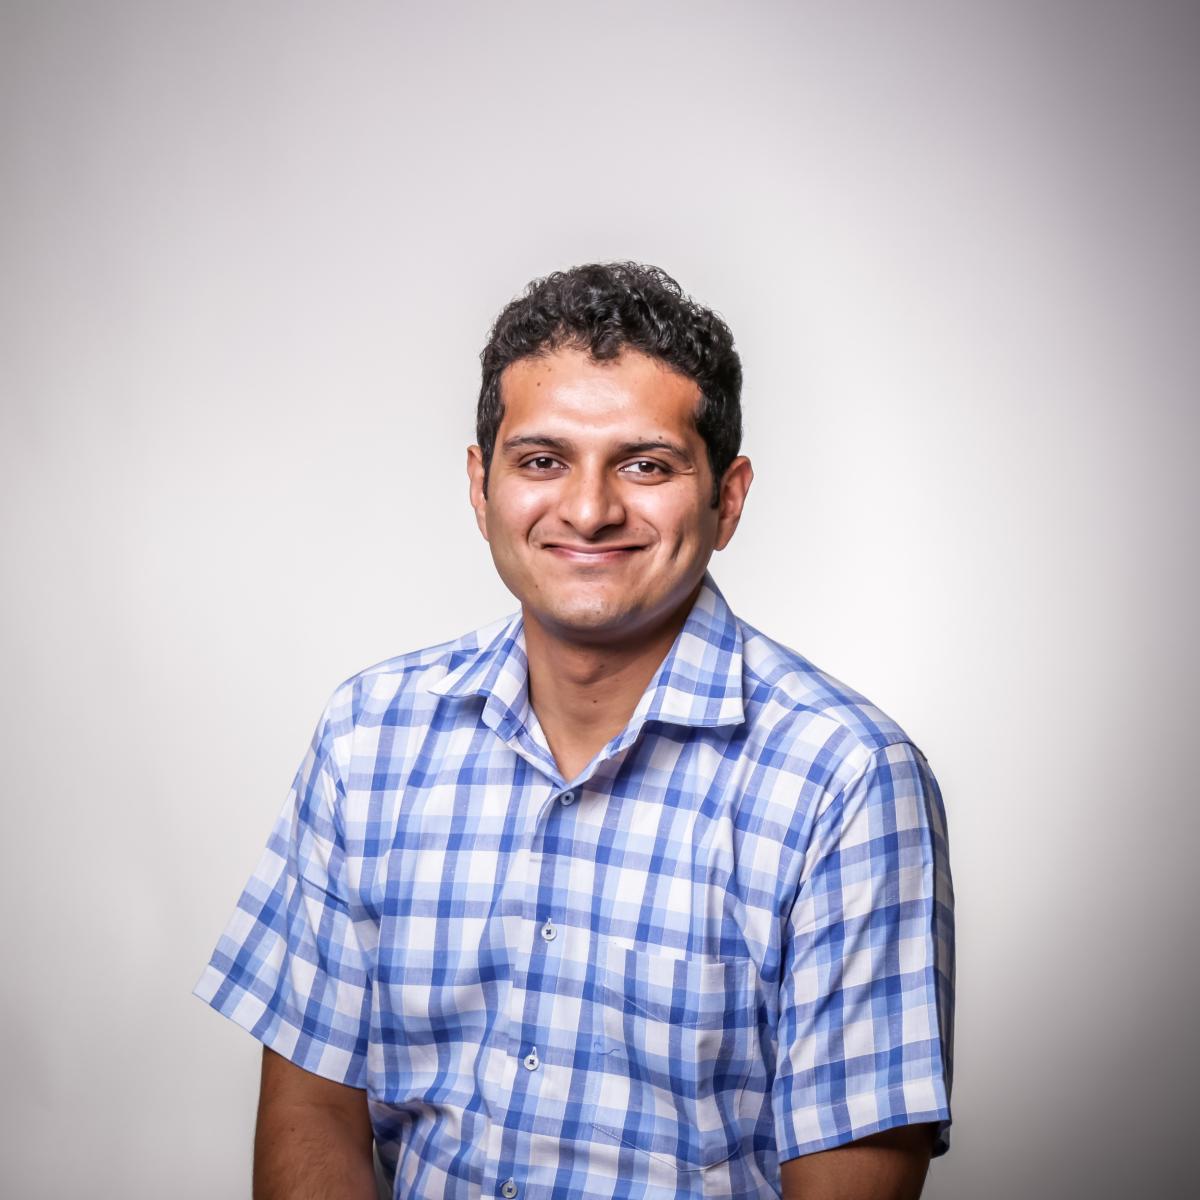 Gandhar Rao's headshot